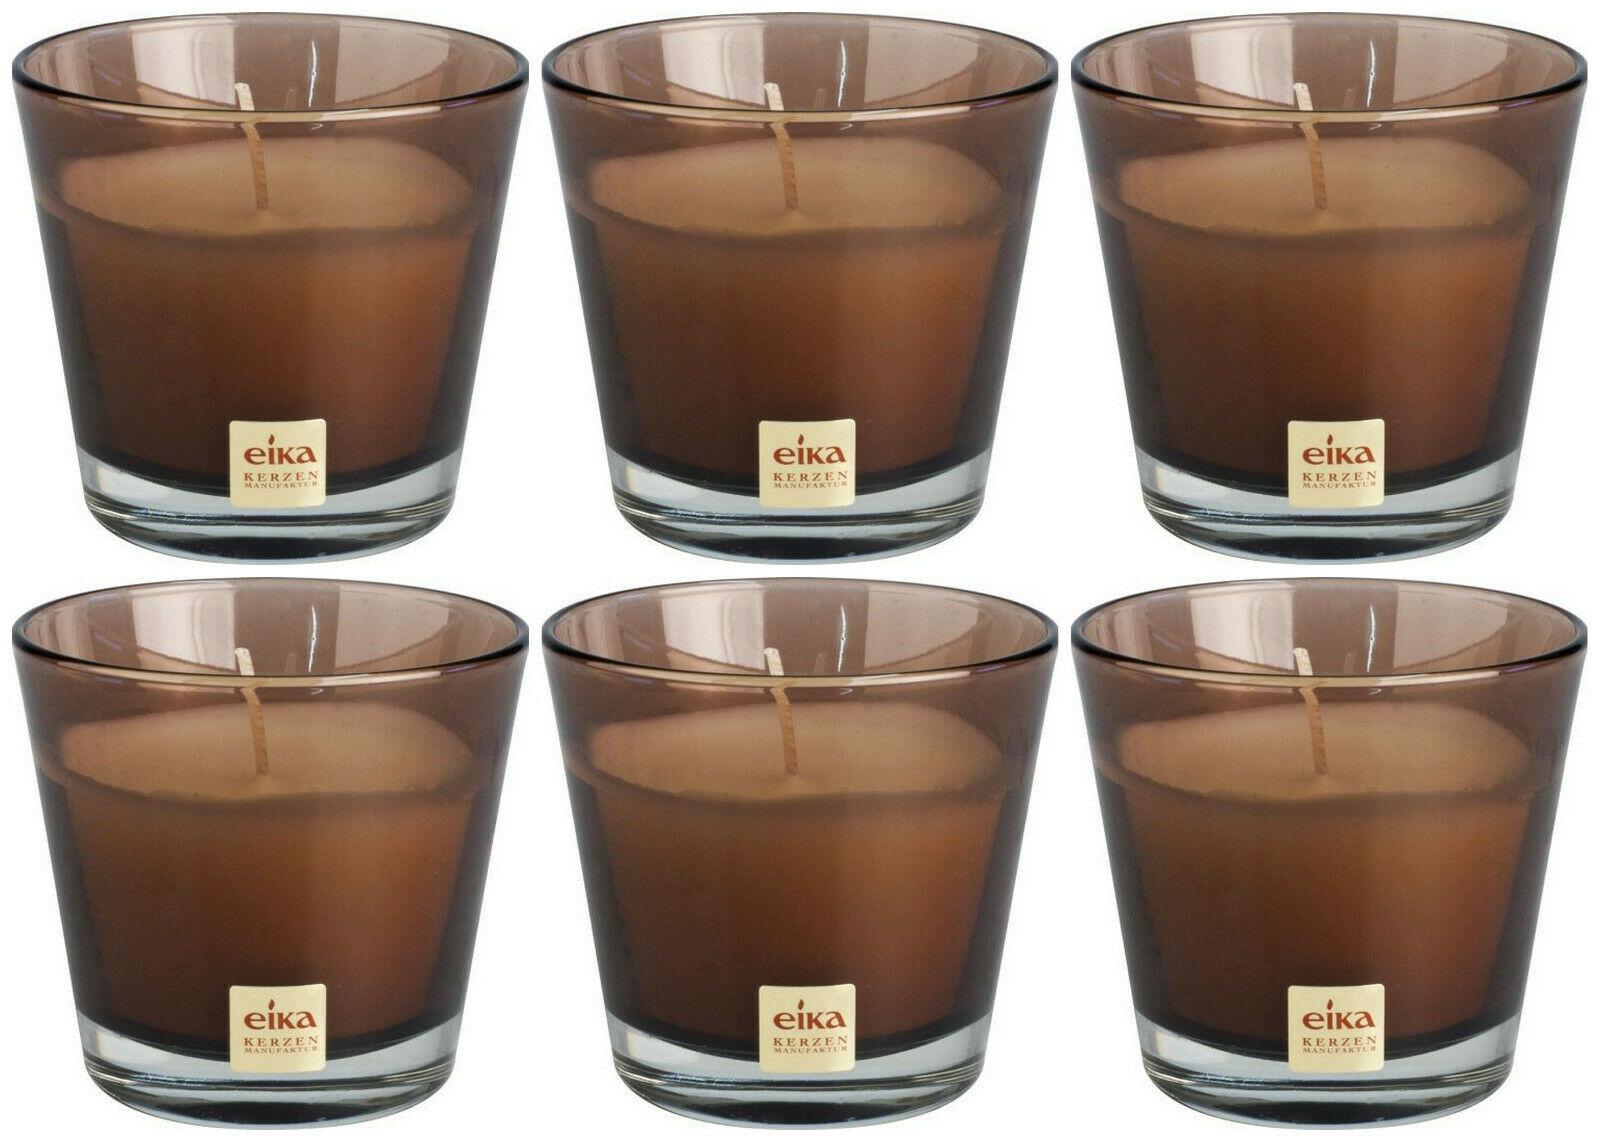 6 Stück Eika Kerzenglas 90x82 mm LARA Kerzen im Glas Candle Wachs Windlichtkerze - Cappuccino